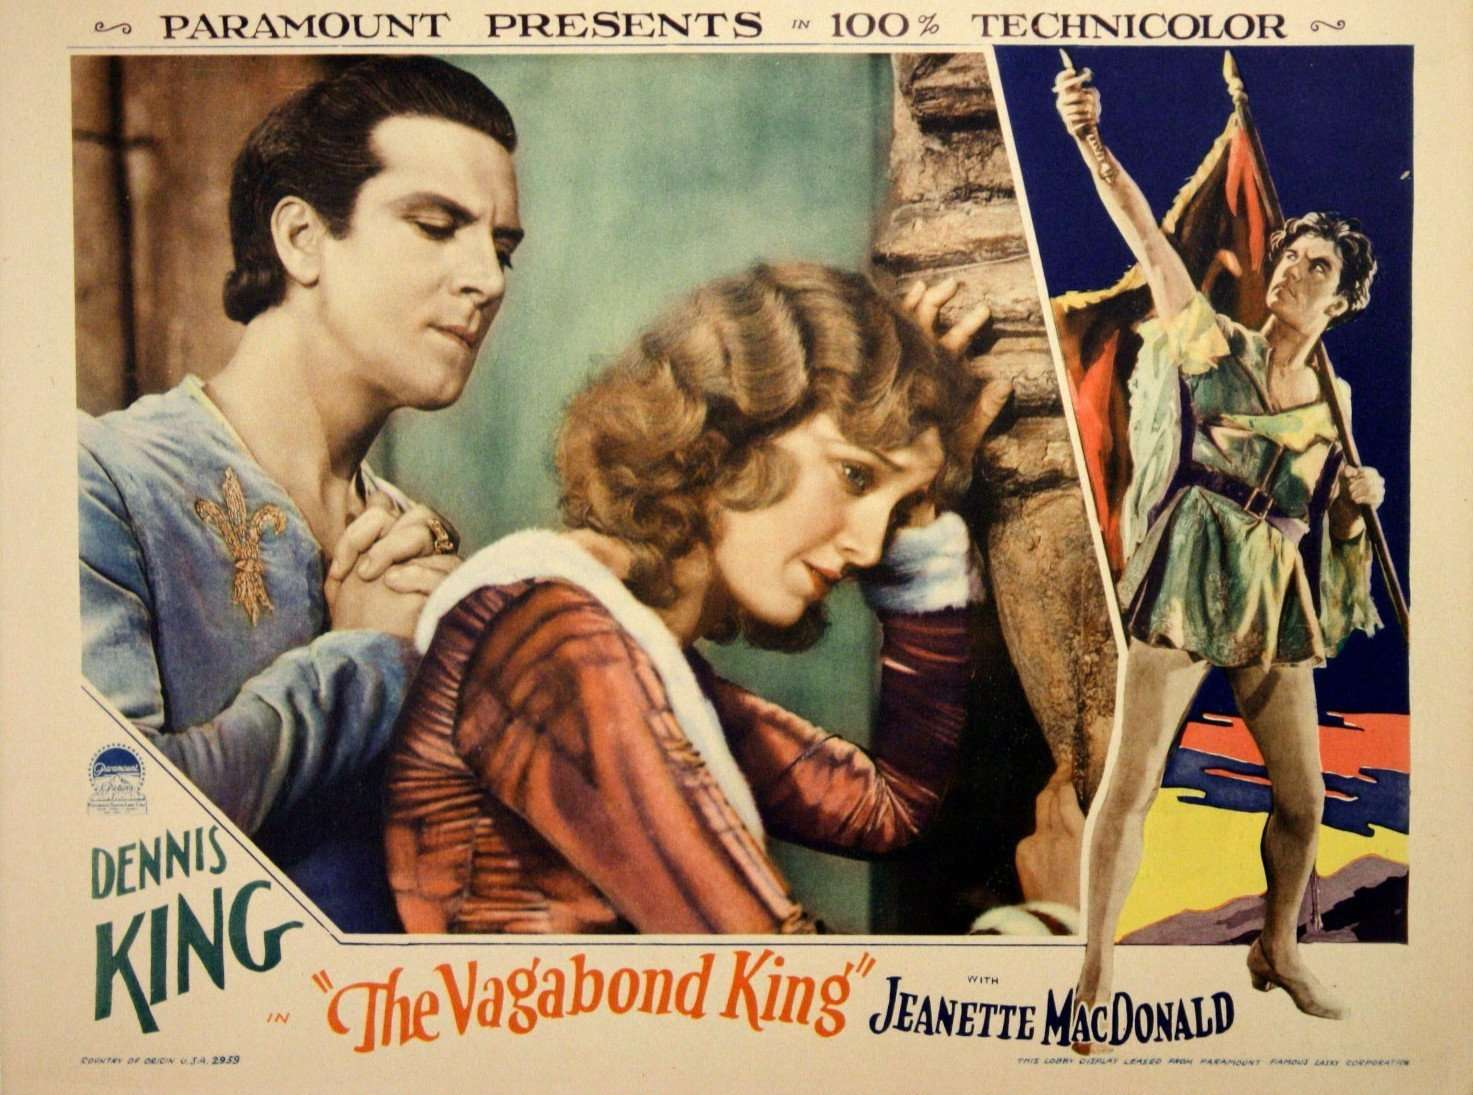 Locandina del musical The Vagabond King